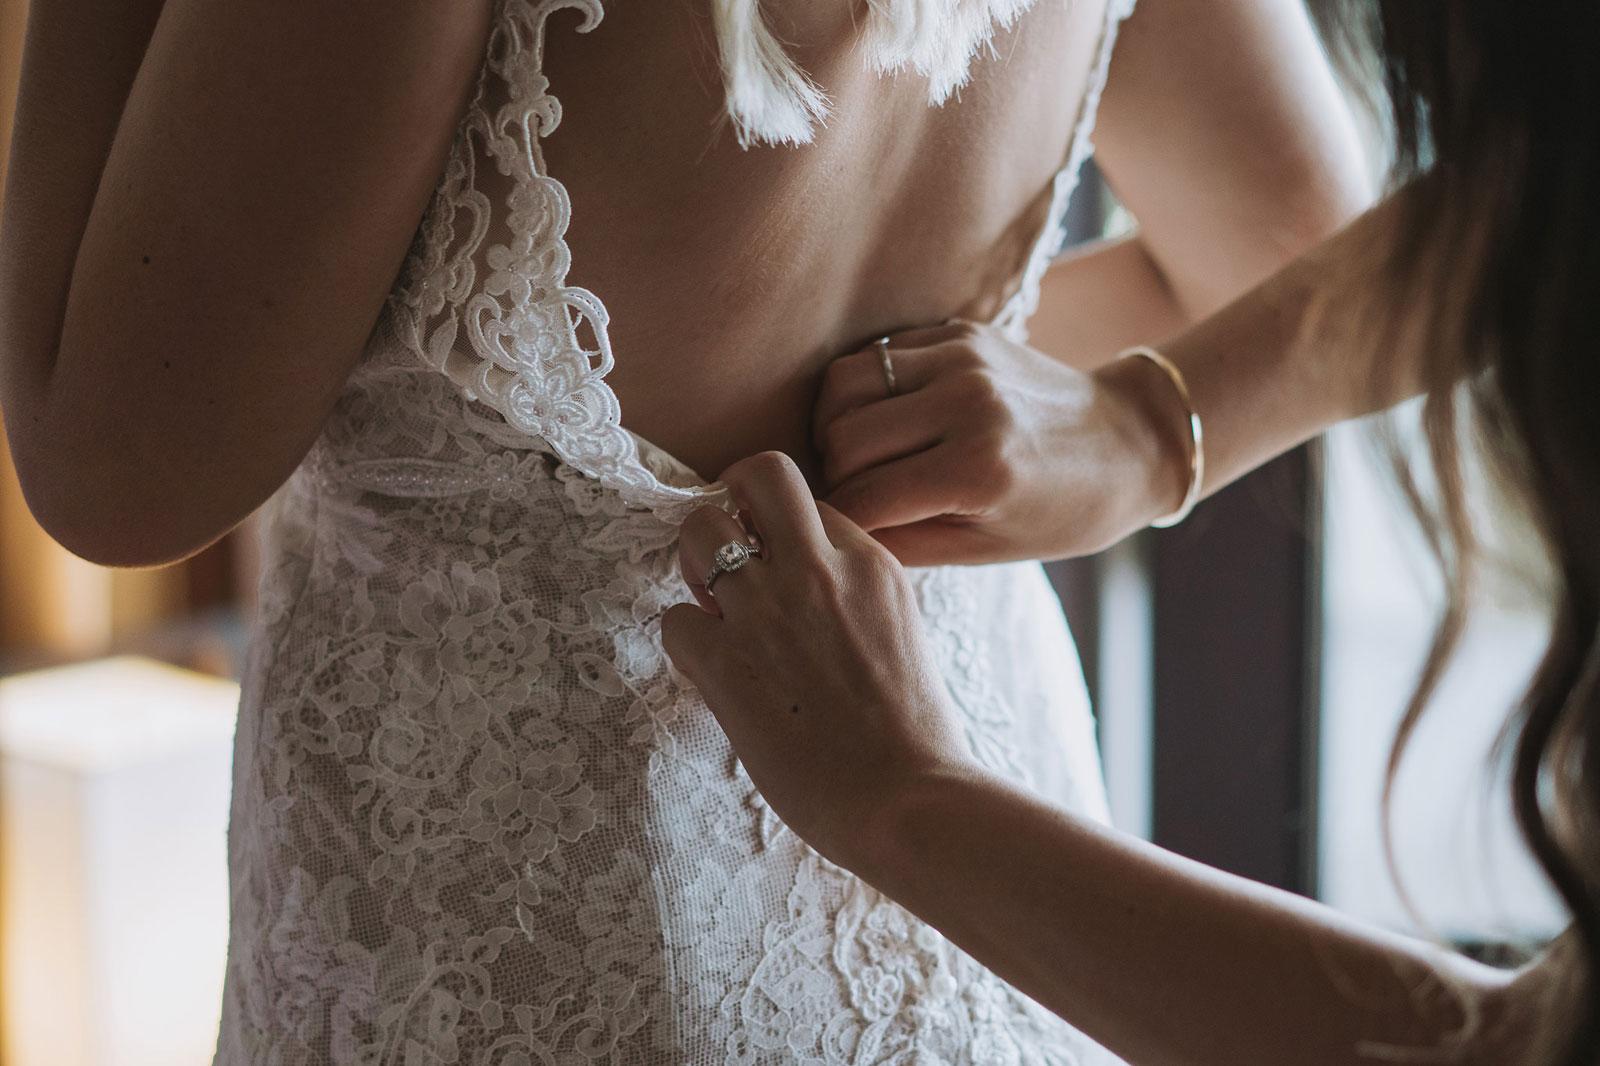 newfound-j-j-bali-nusa-dua-wedding-wedding-photographer-038-a